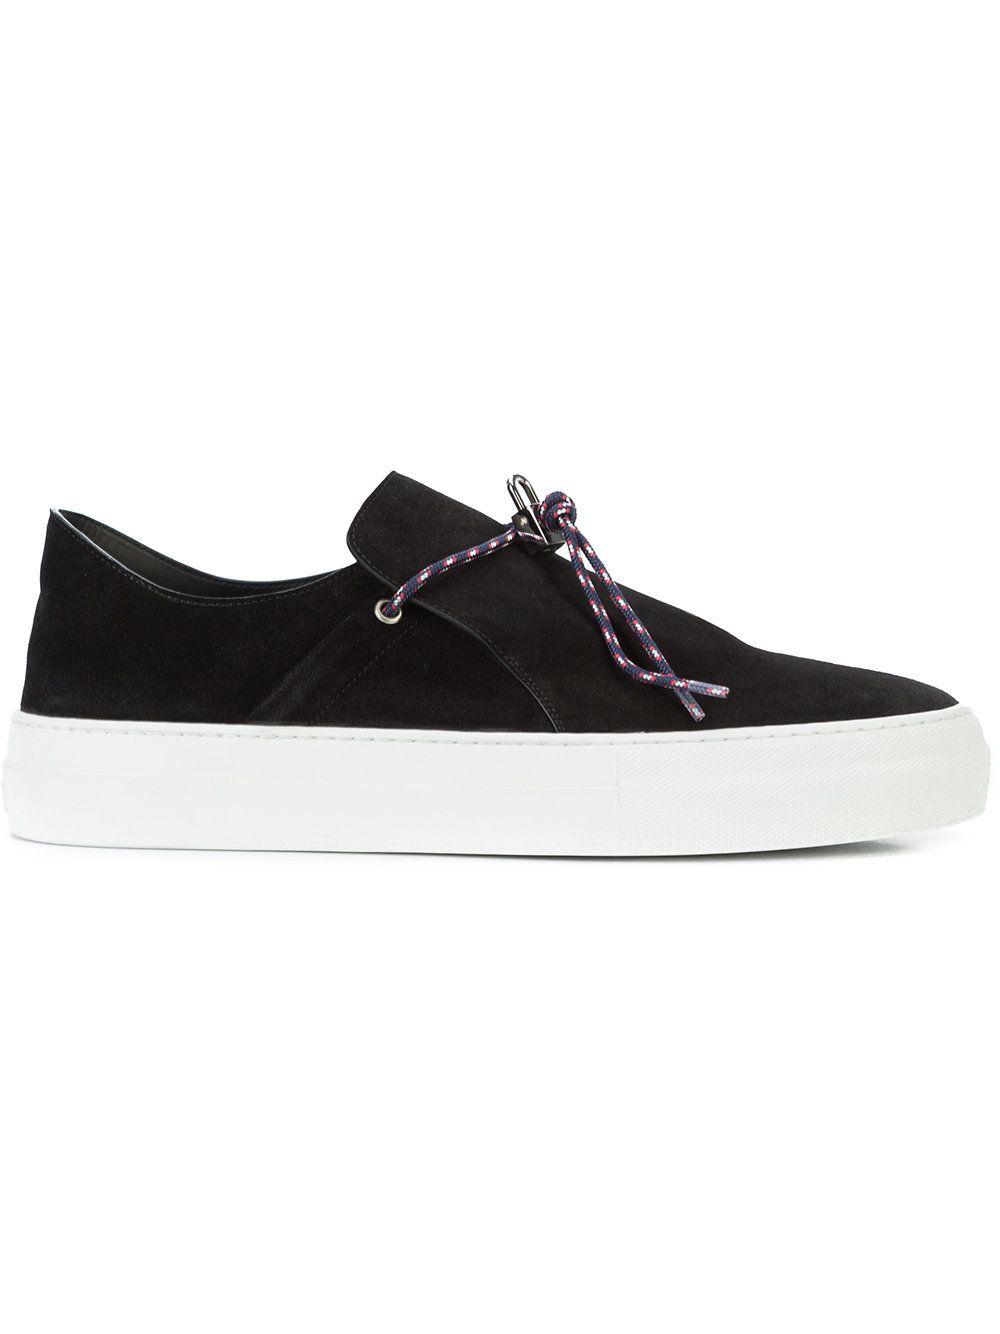 BUSCEMI Sabot Campo sneakers pRhZTz